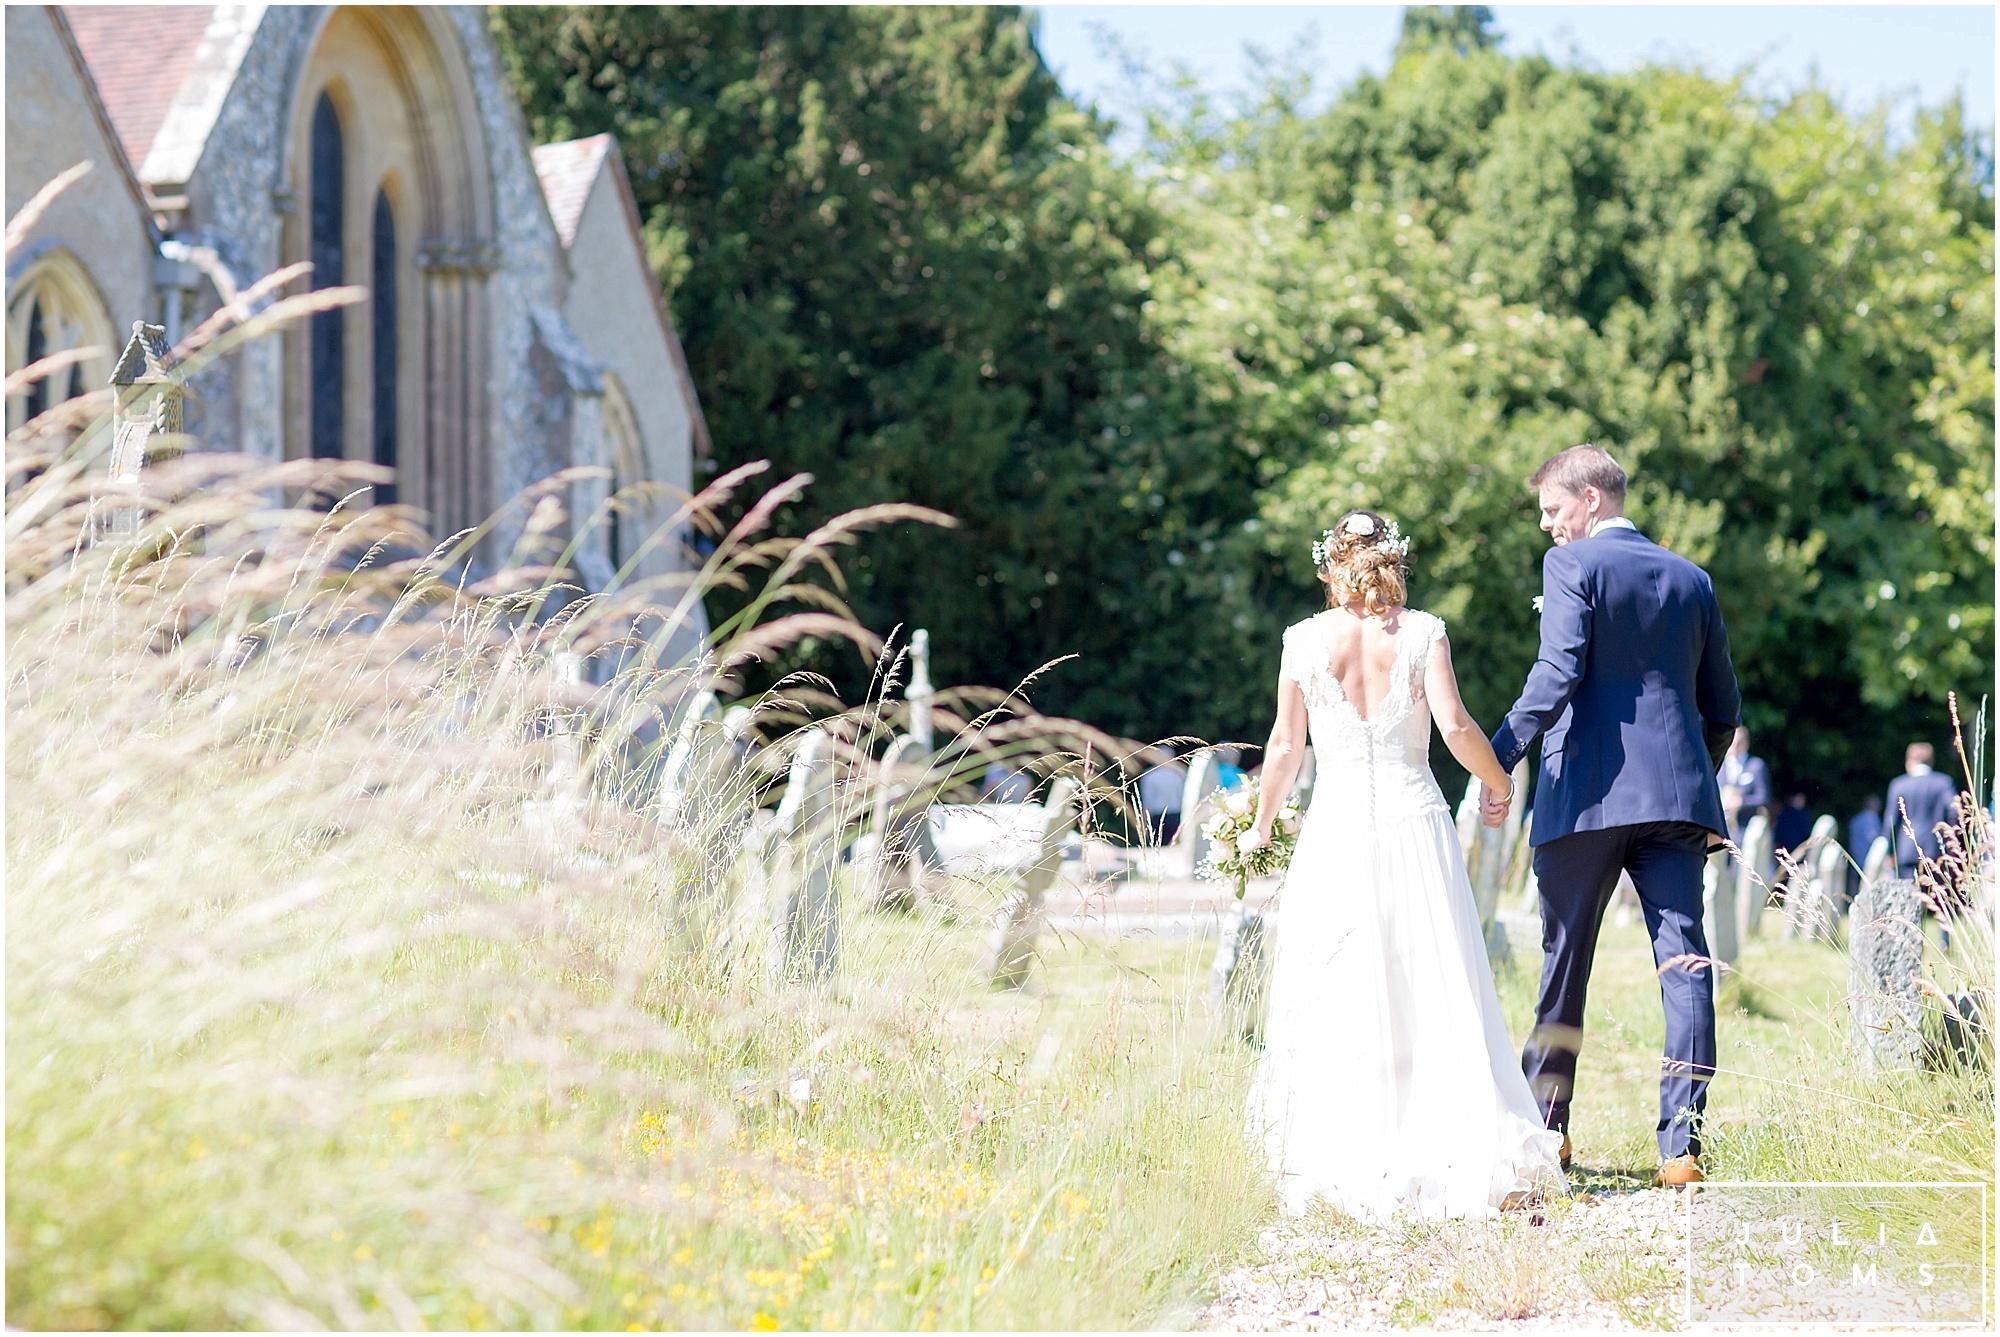 julia_toms_chichester_wedding_photographer_portsmouth_037.jpg